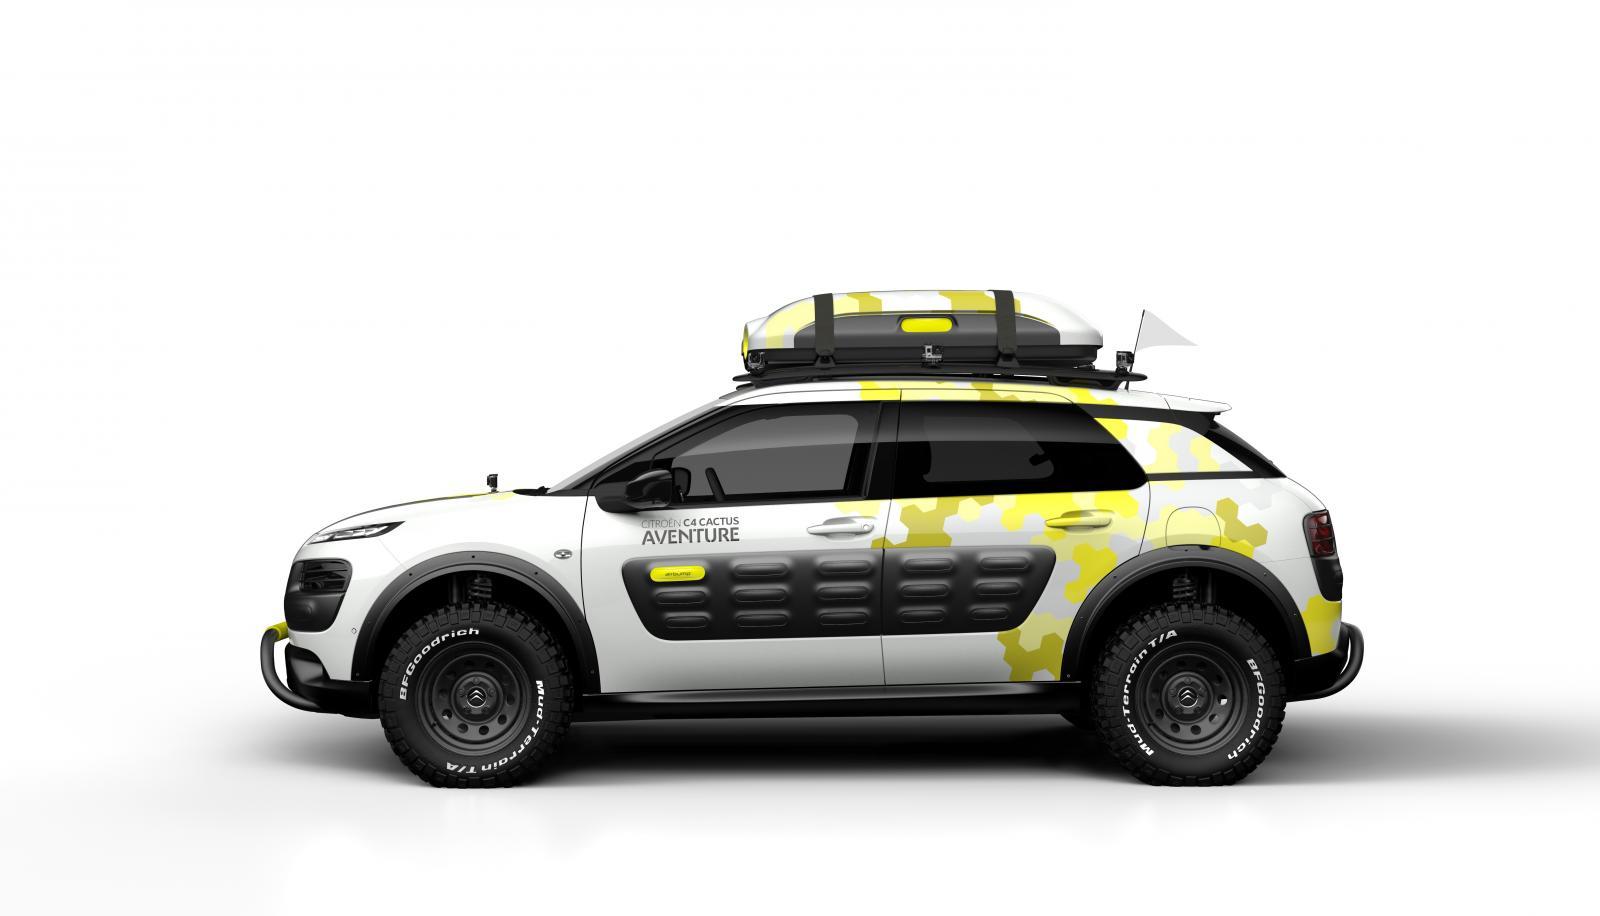 Concept-Car C4 Cactus Aventure 2014 vue latérale